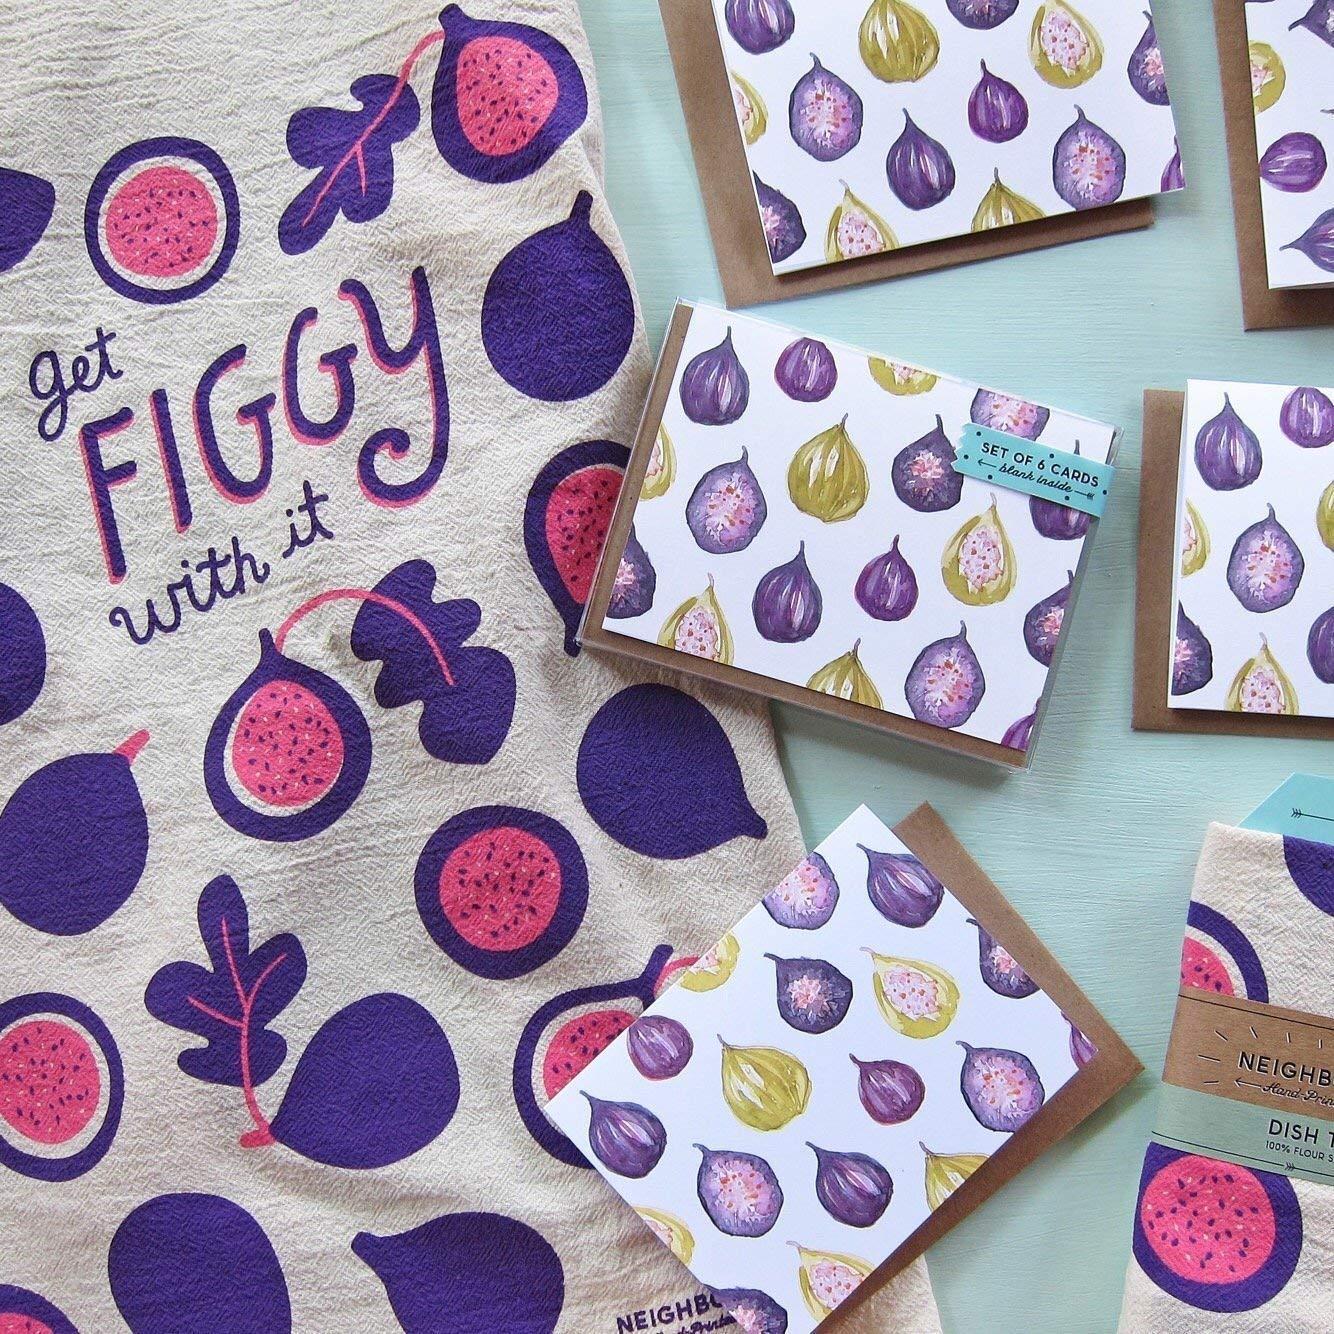 Get Figgy With It Kitchen Flour Sack Towel